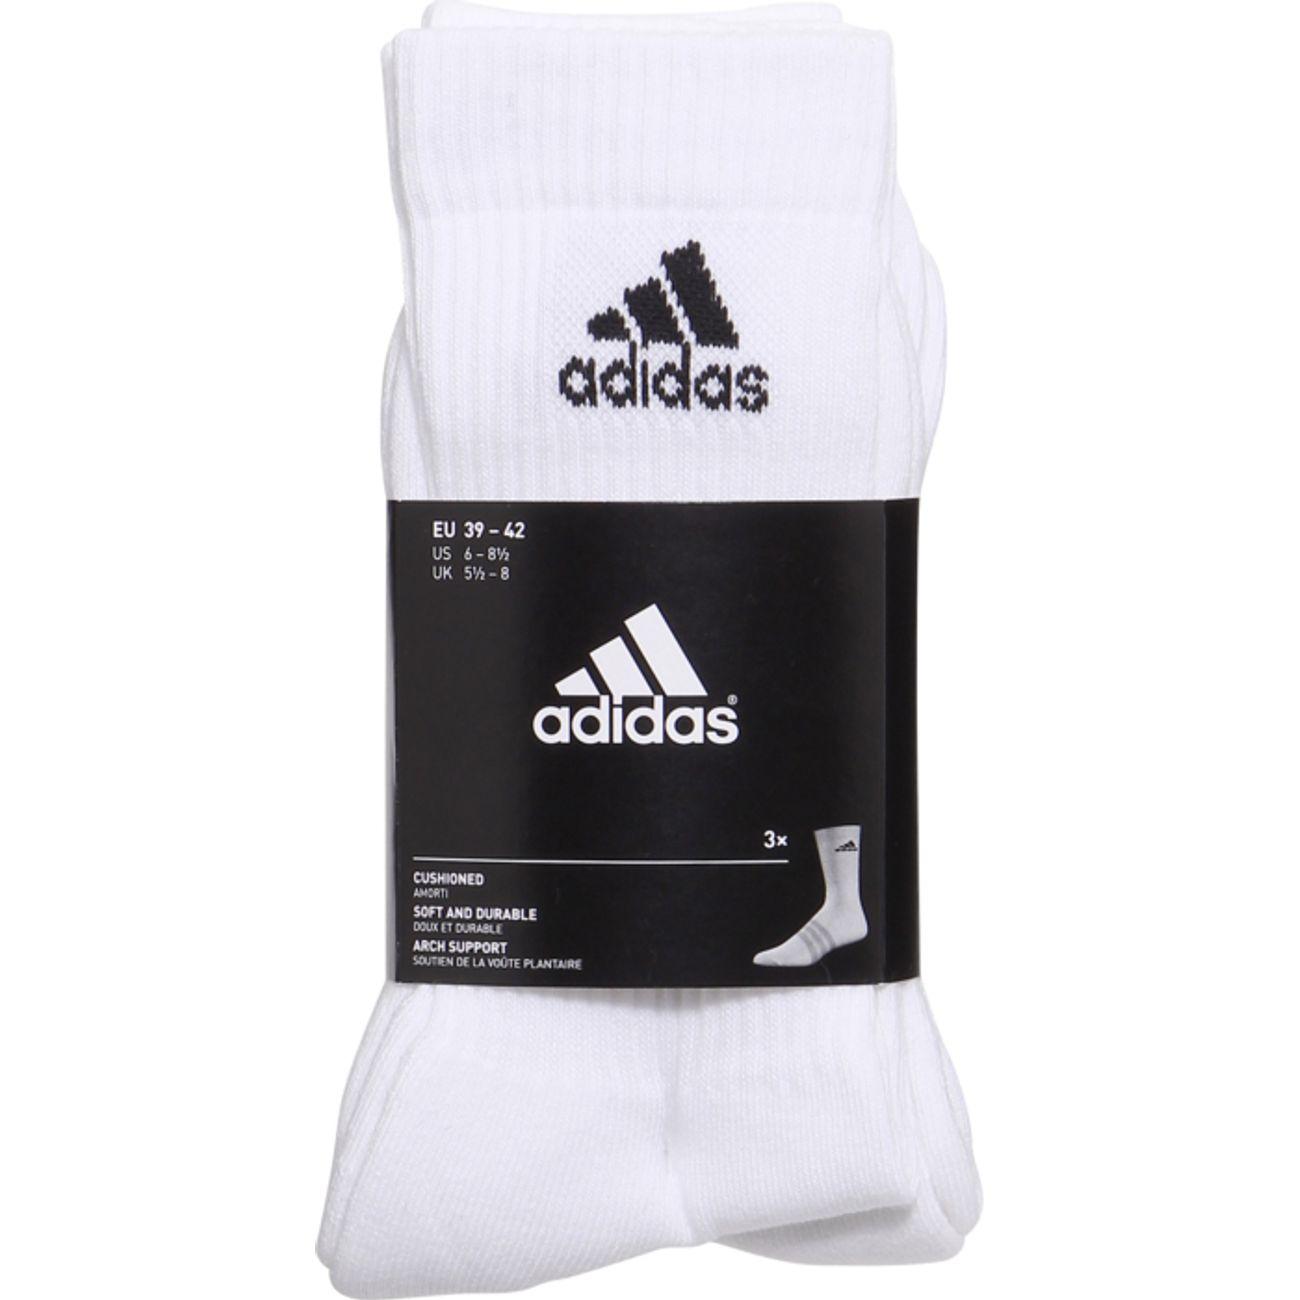 Hc 85200 Per Cr Tennis 3p Chaussette Adidas 3s 4A35jLRq